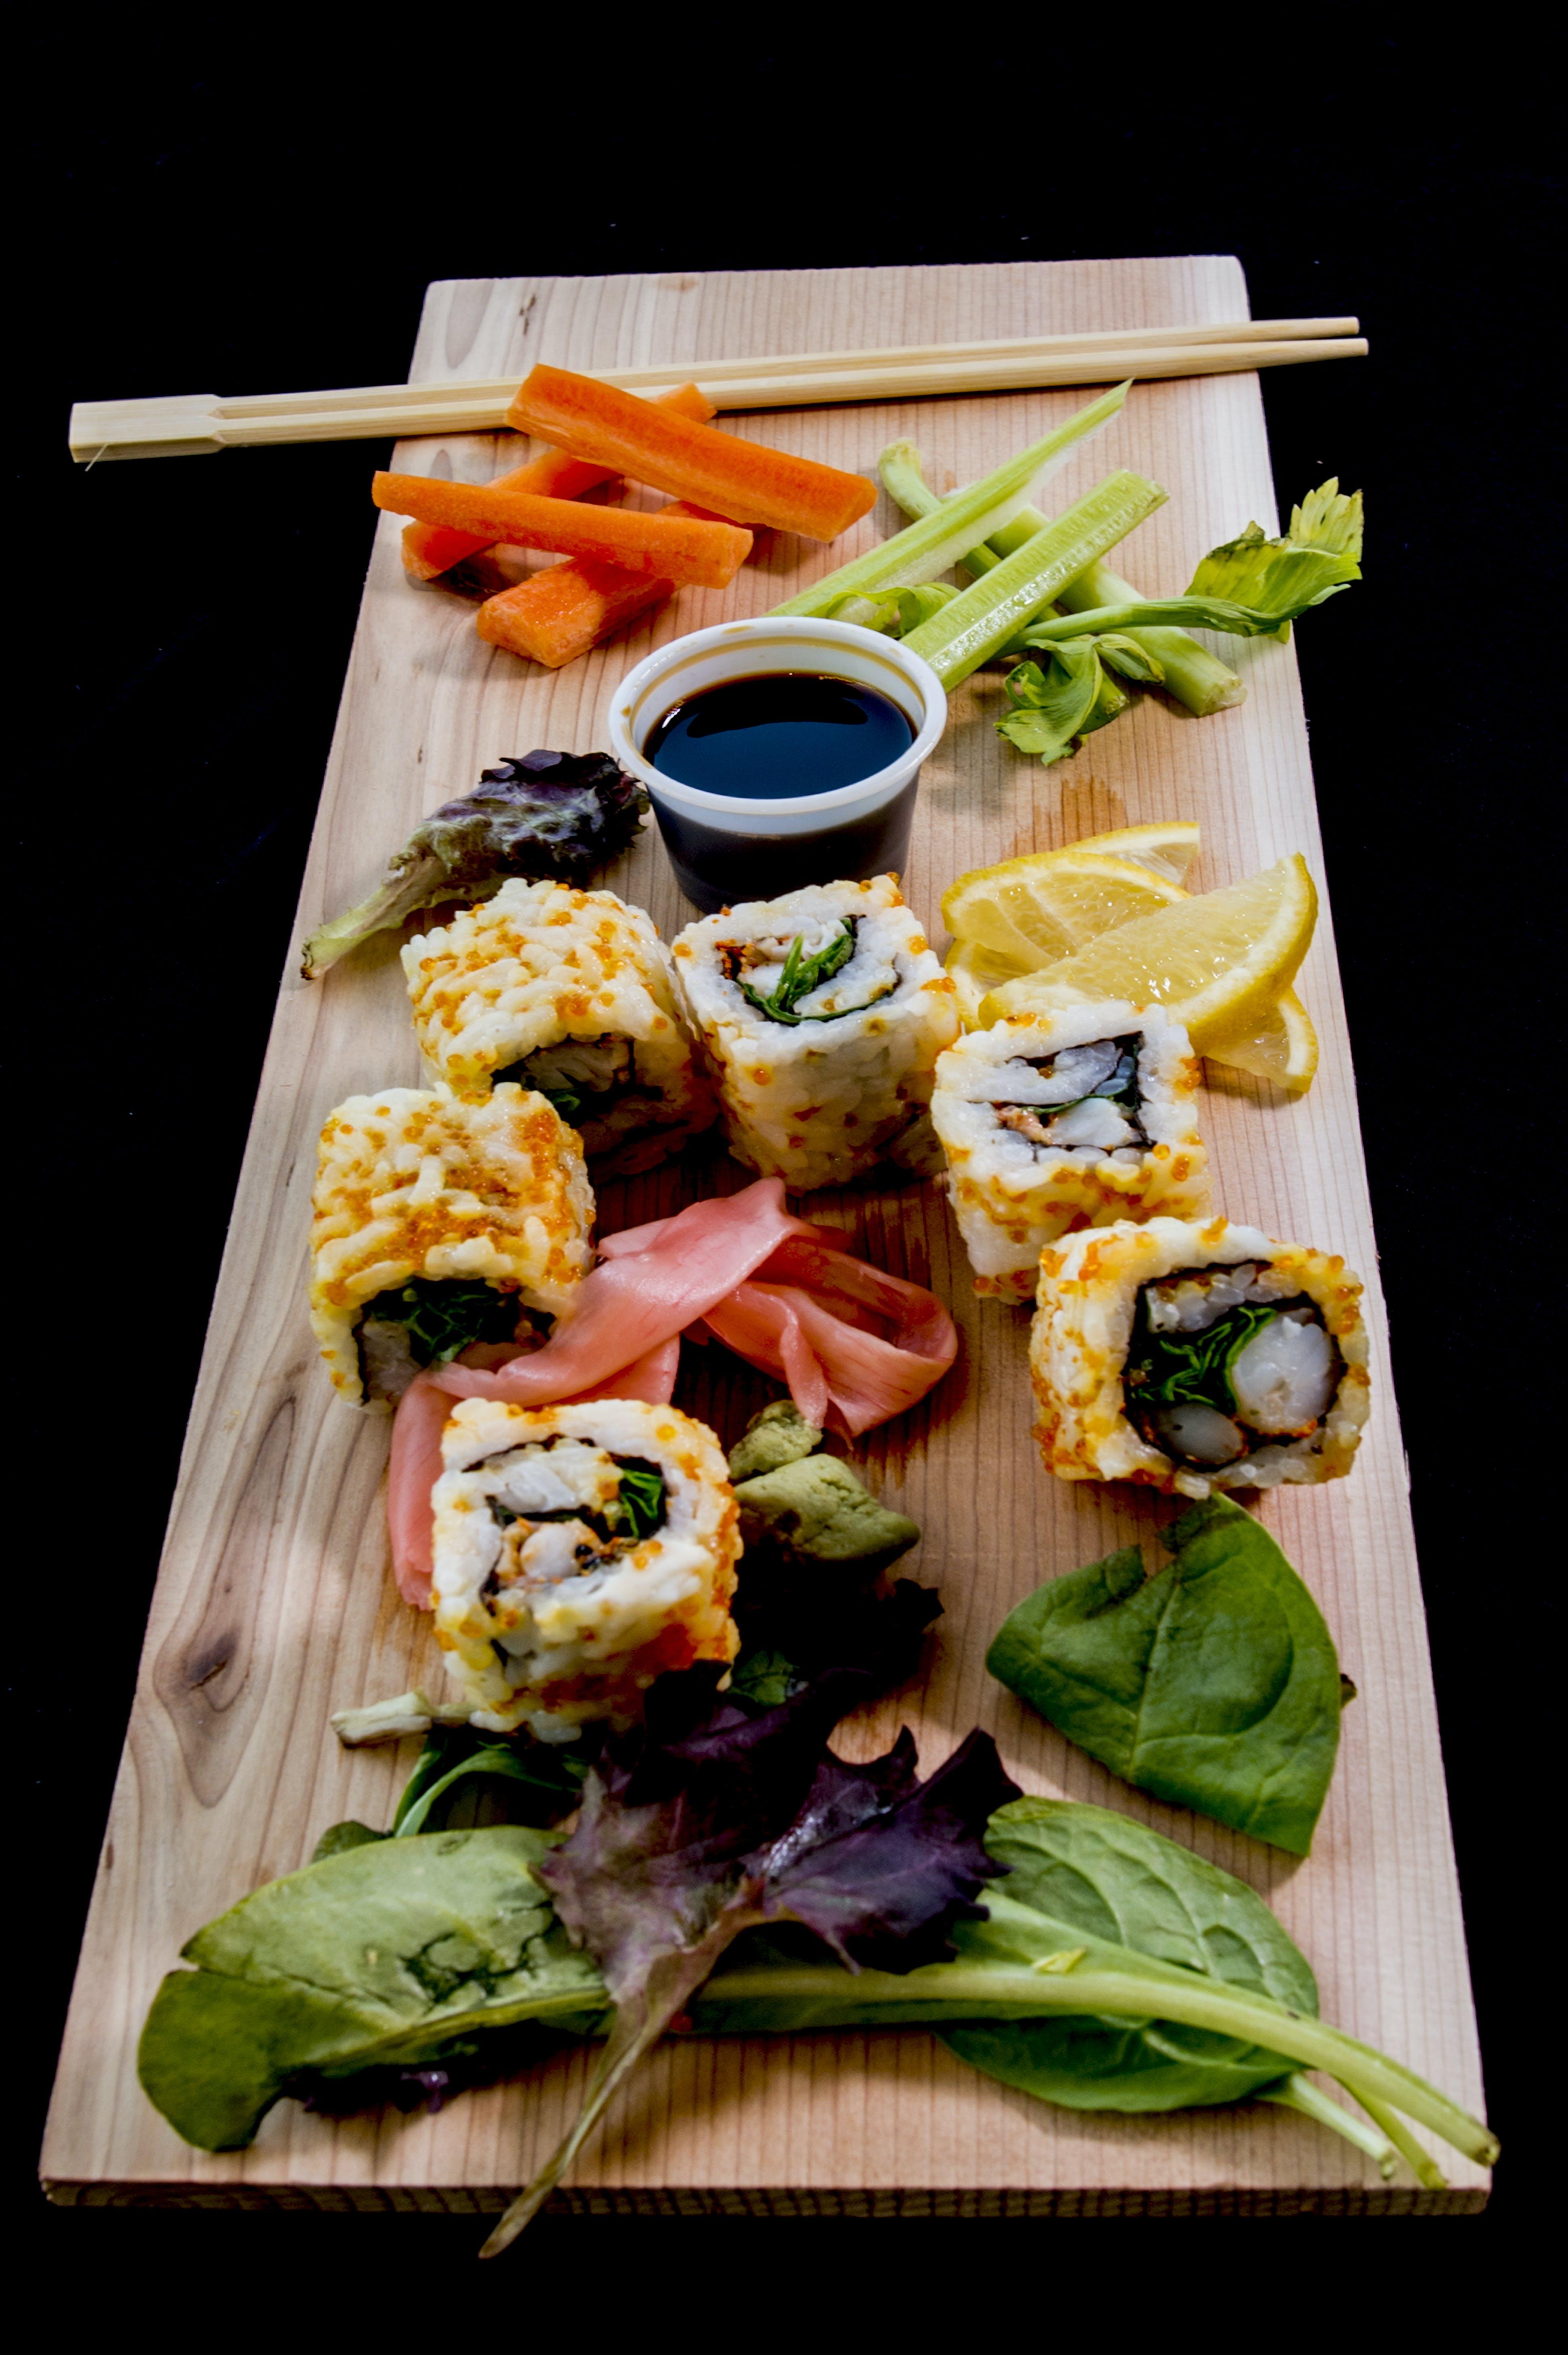 Fotos de stock gratuitas de apetecible, arroz, asiático, carne